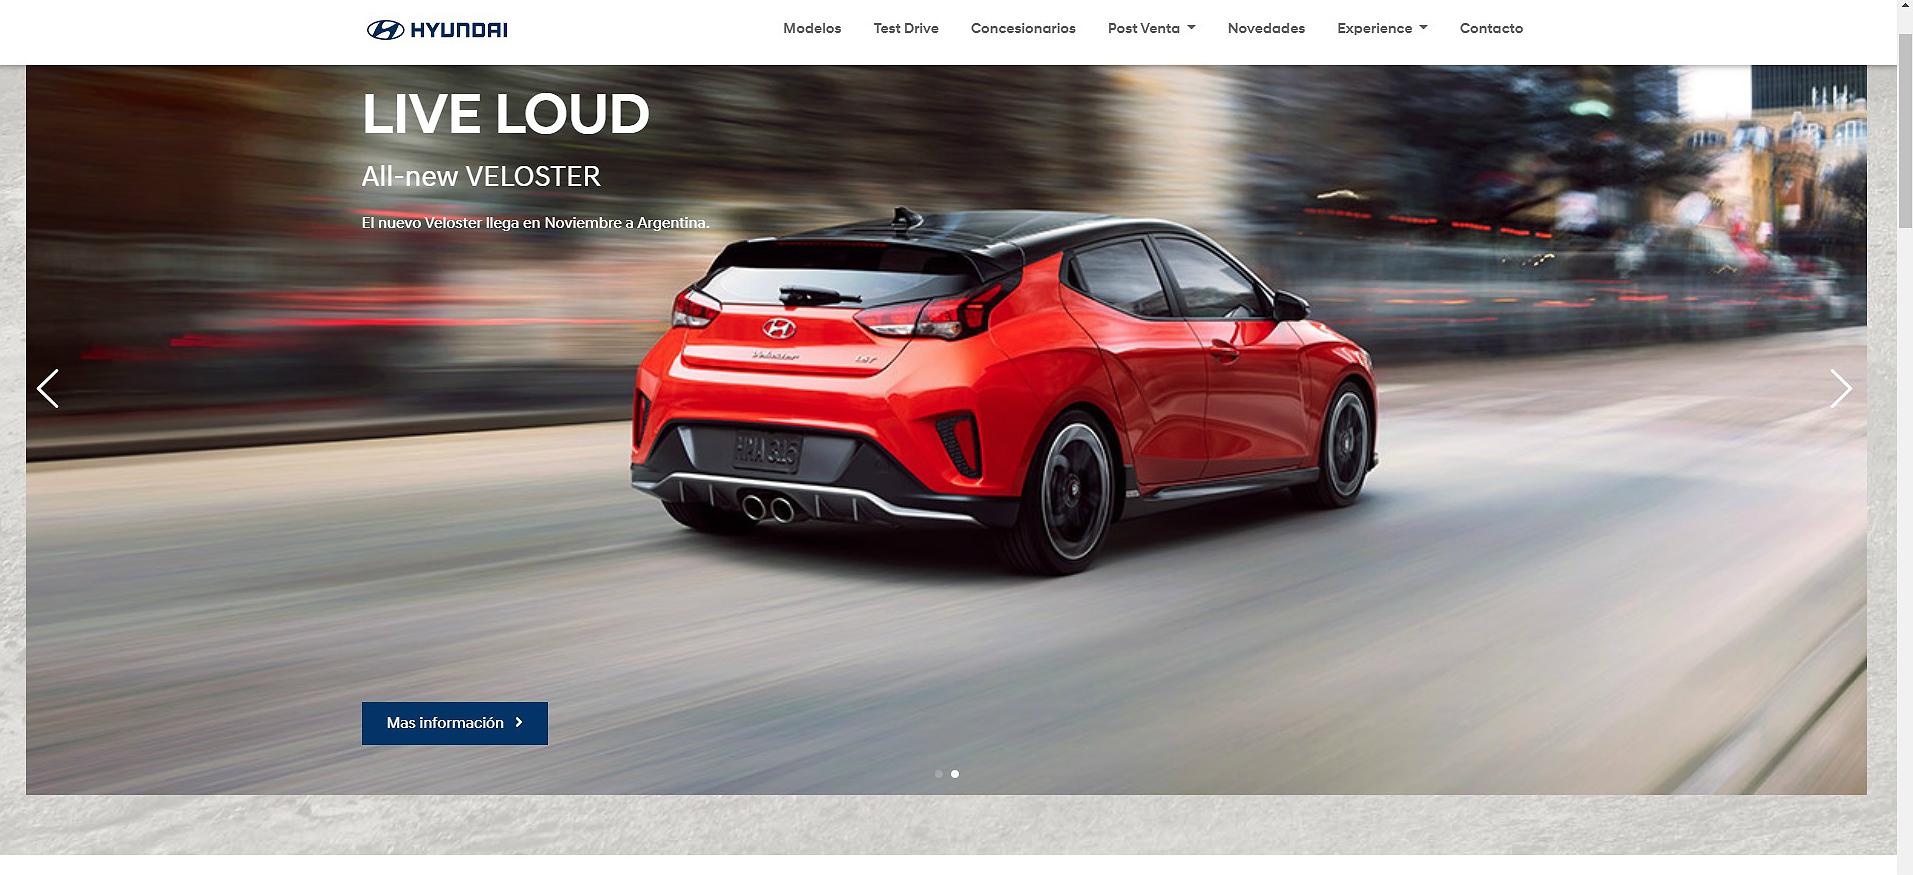 Hyundai Veloster reprodução